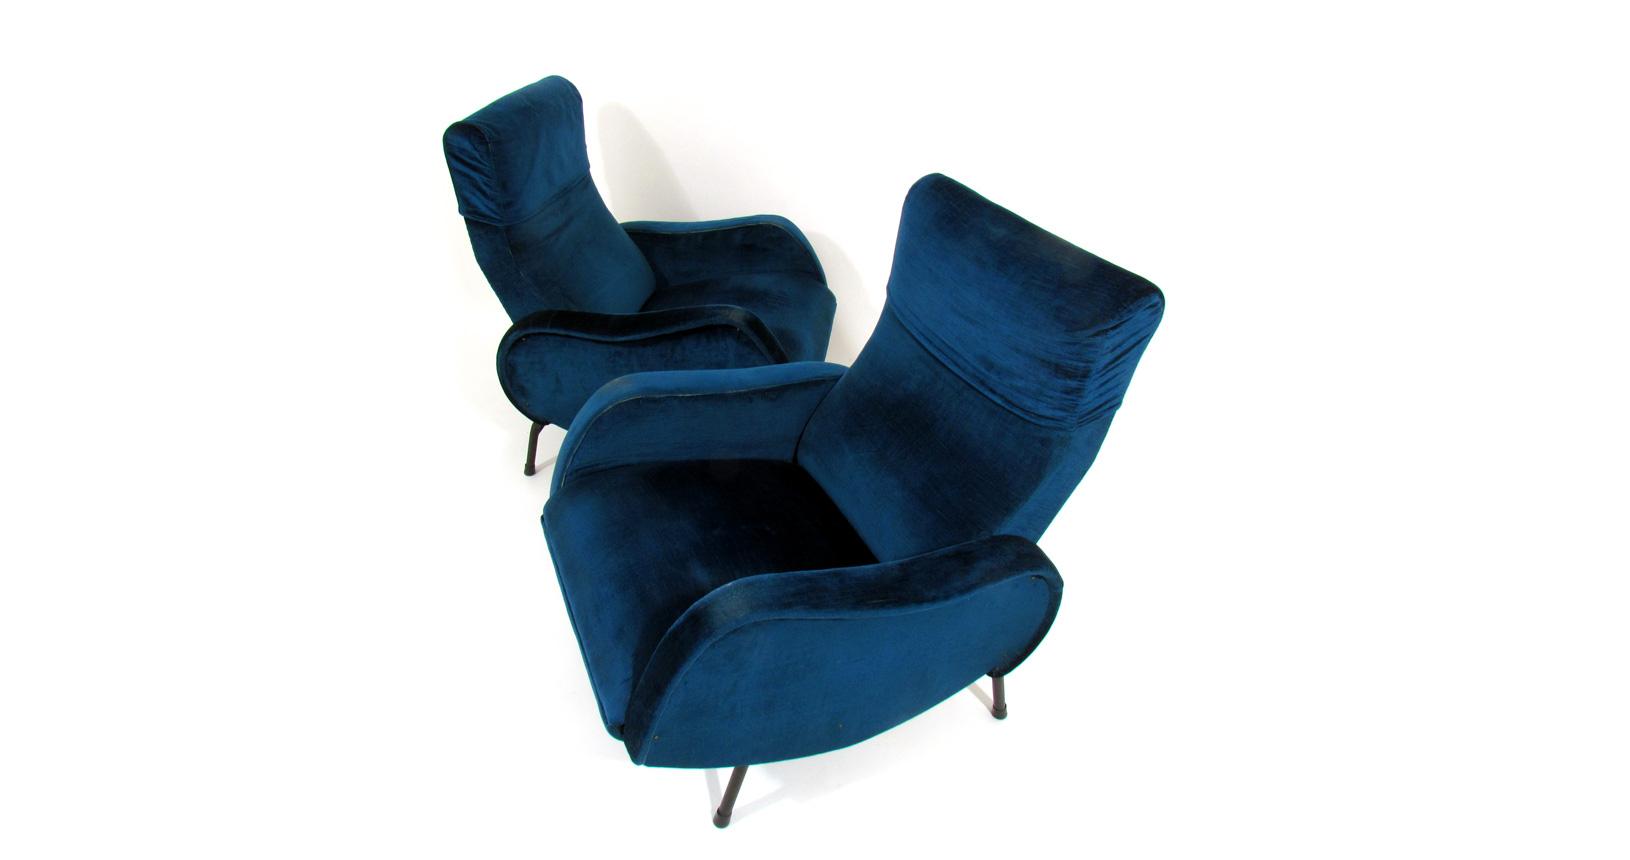 velvet armchairs '60 lady zanuso arflex poltrona velluto